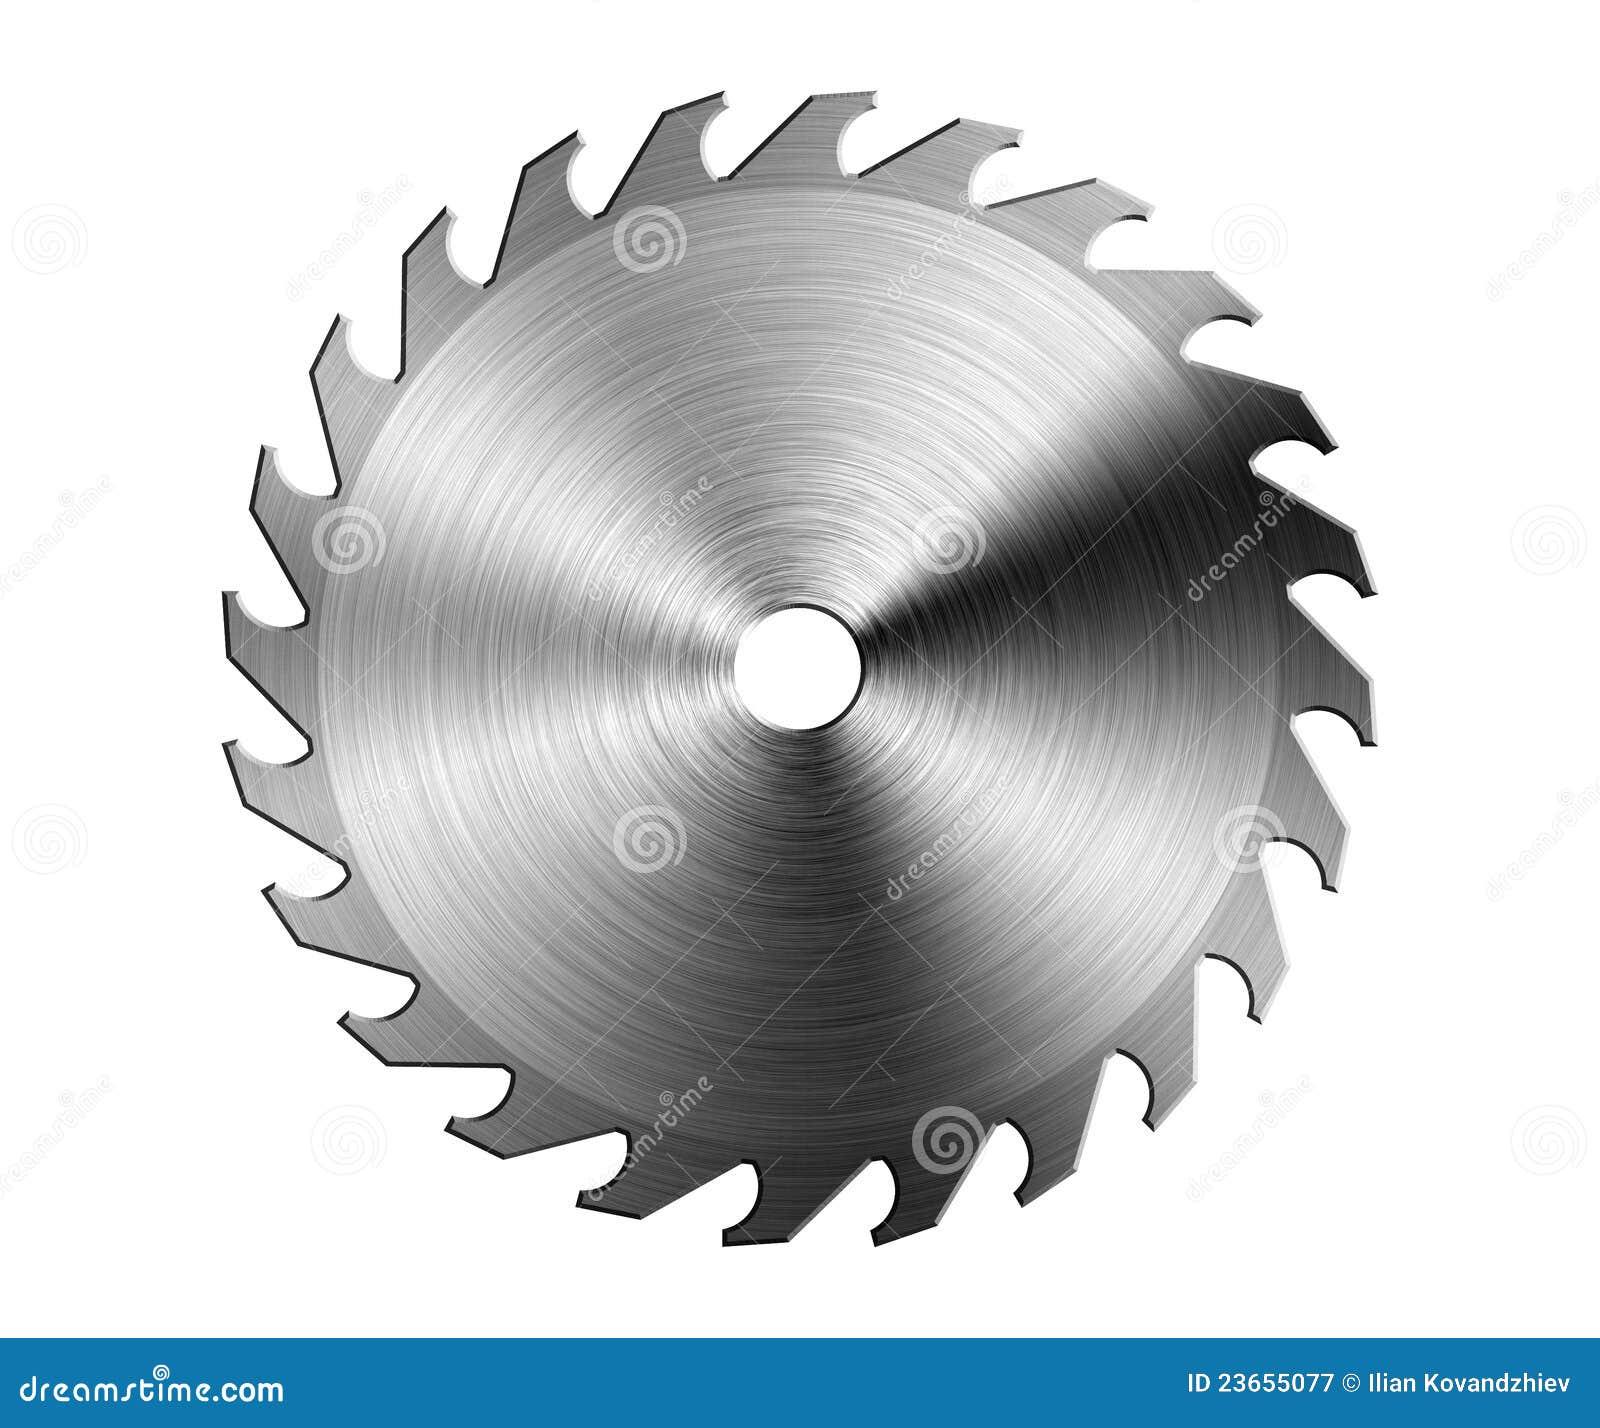 Circular Saw Blade Stock Image Image Of Rotary Safe